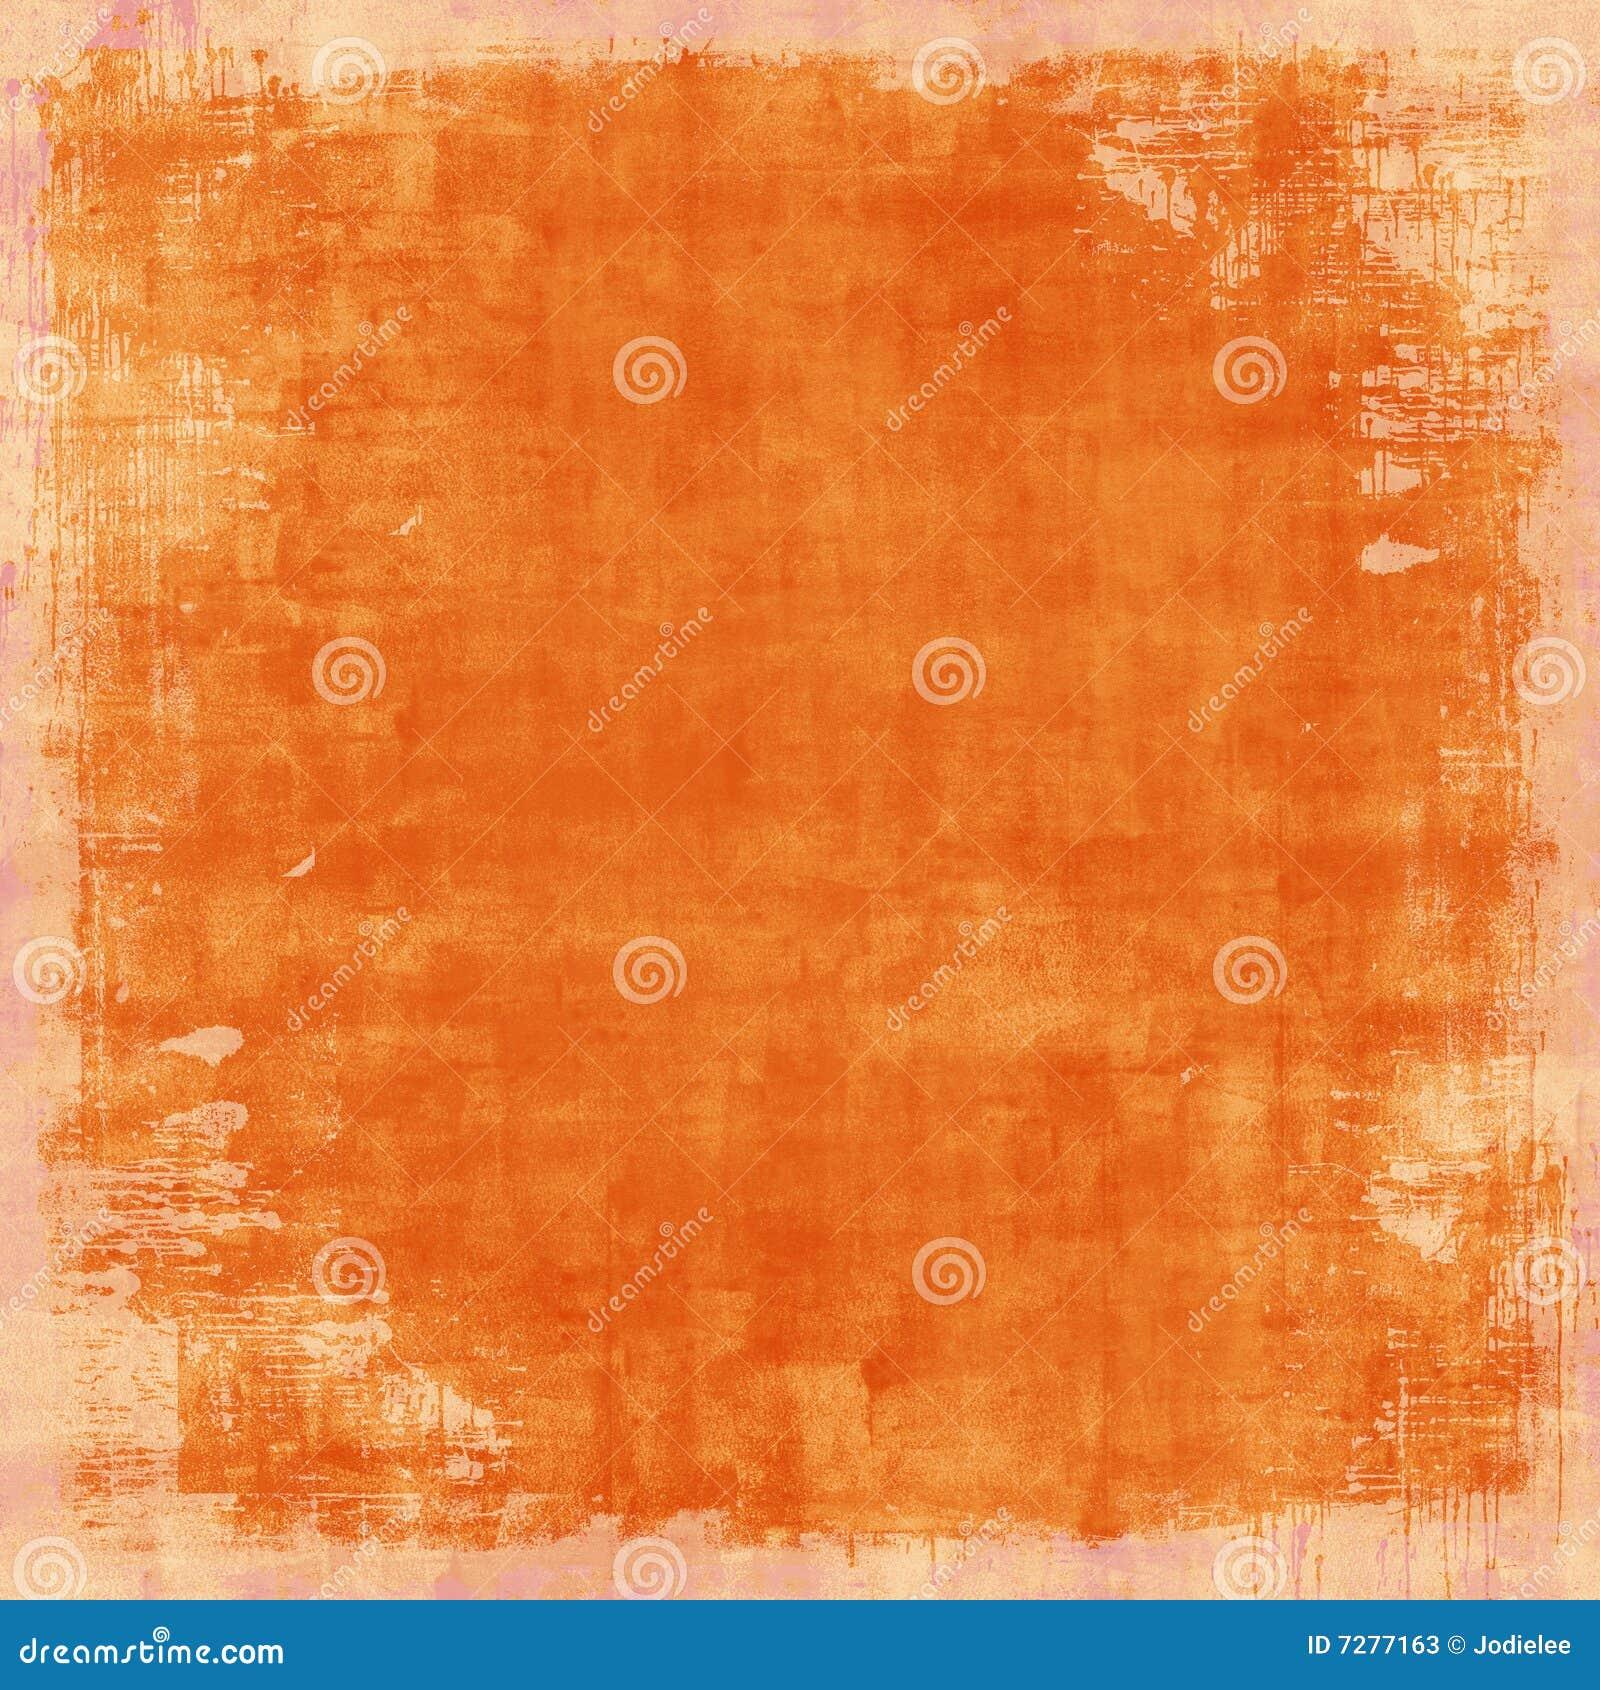 Grungy Distressed Orange Vintage Background Stock Photos